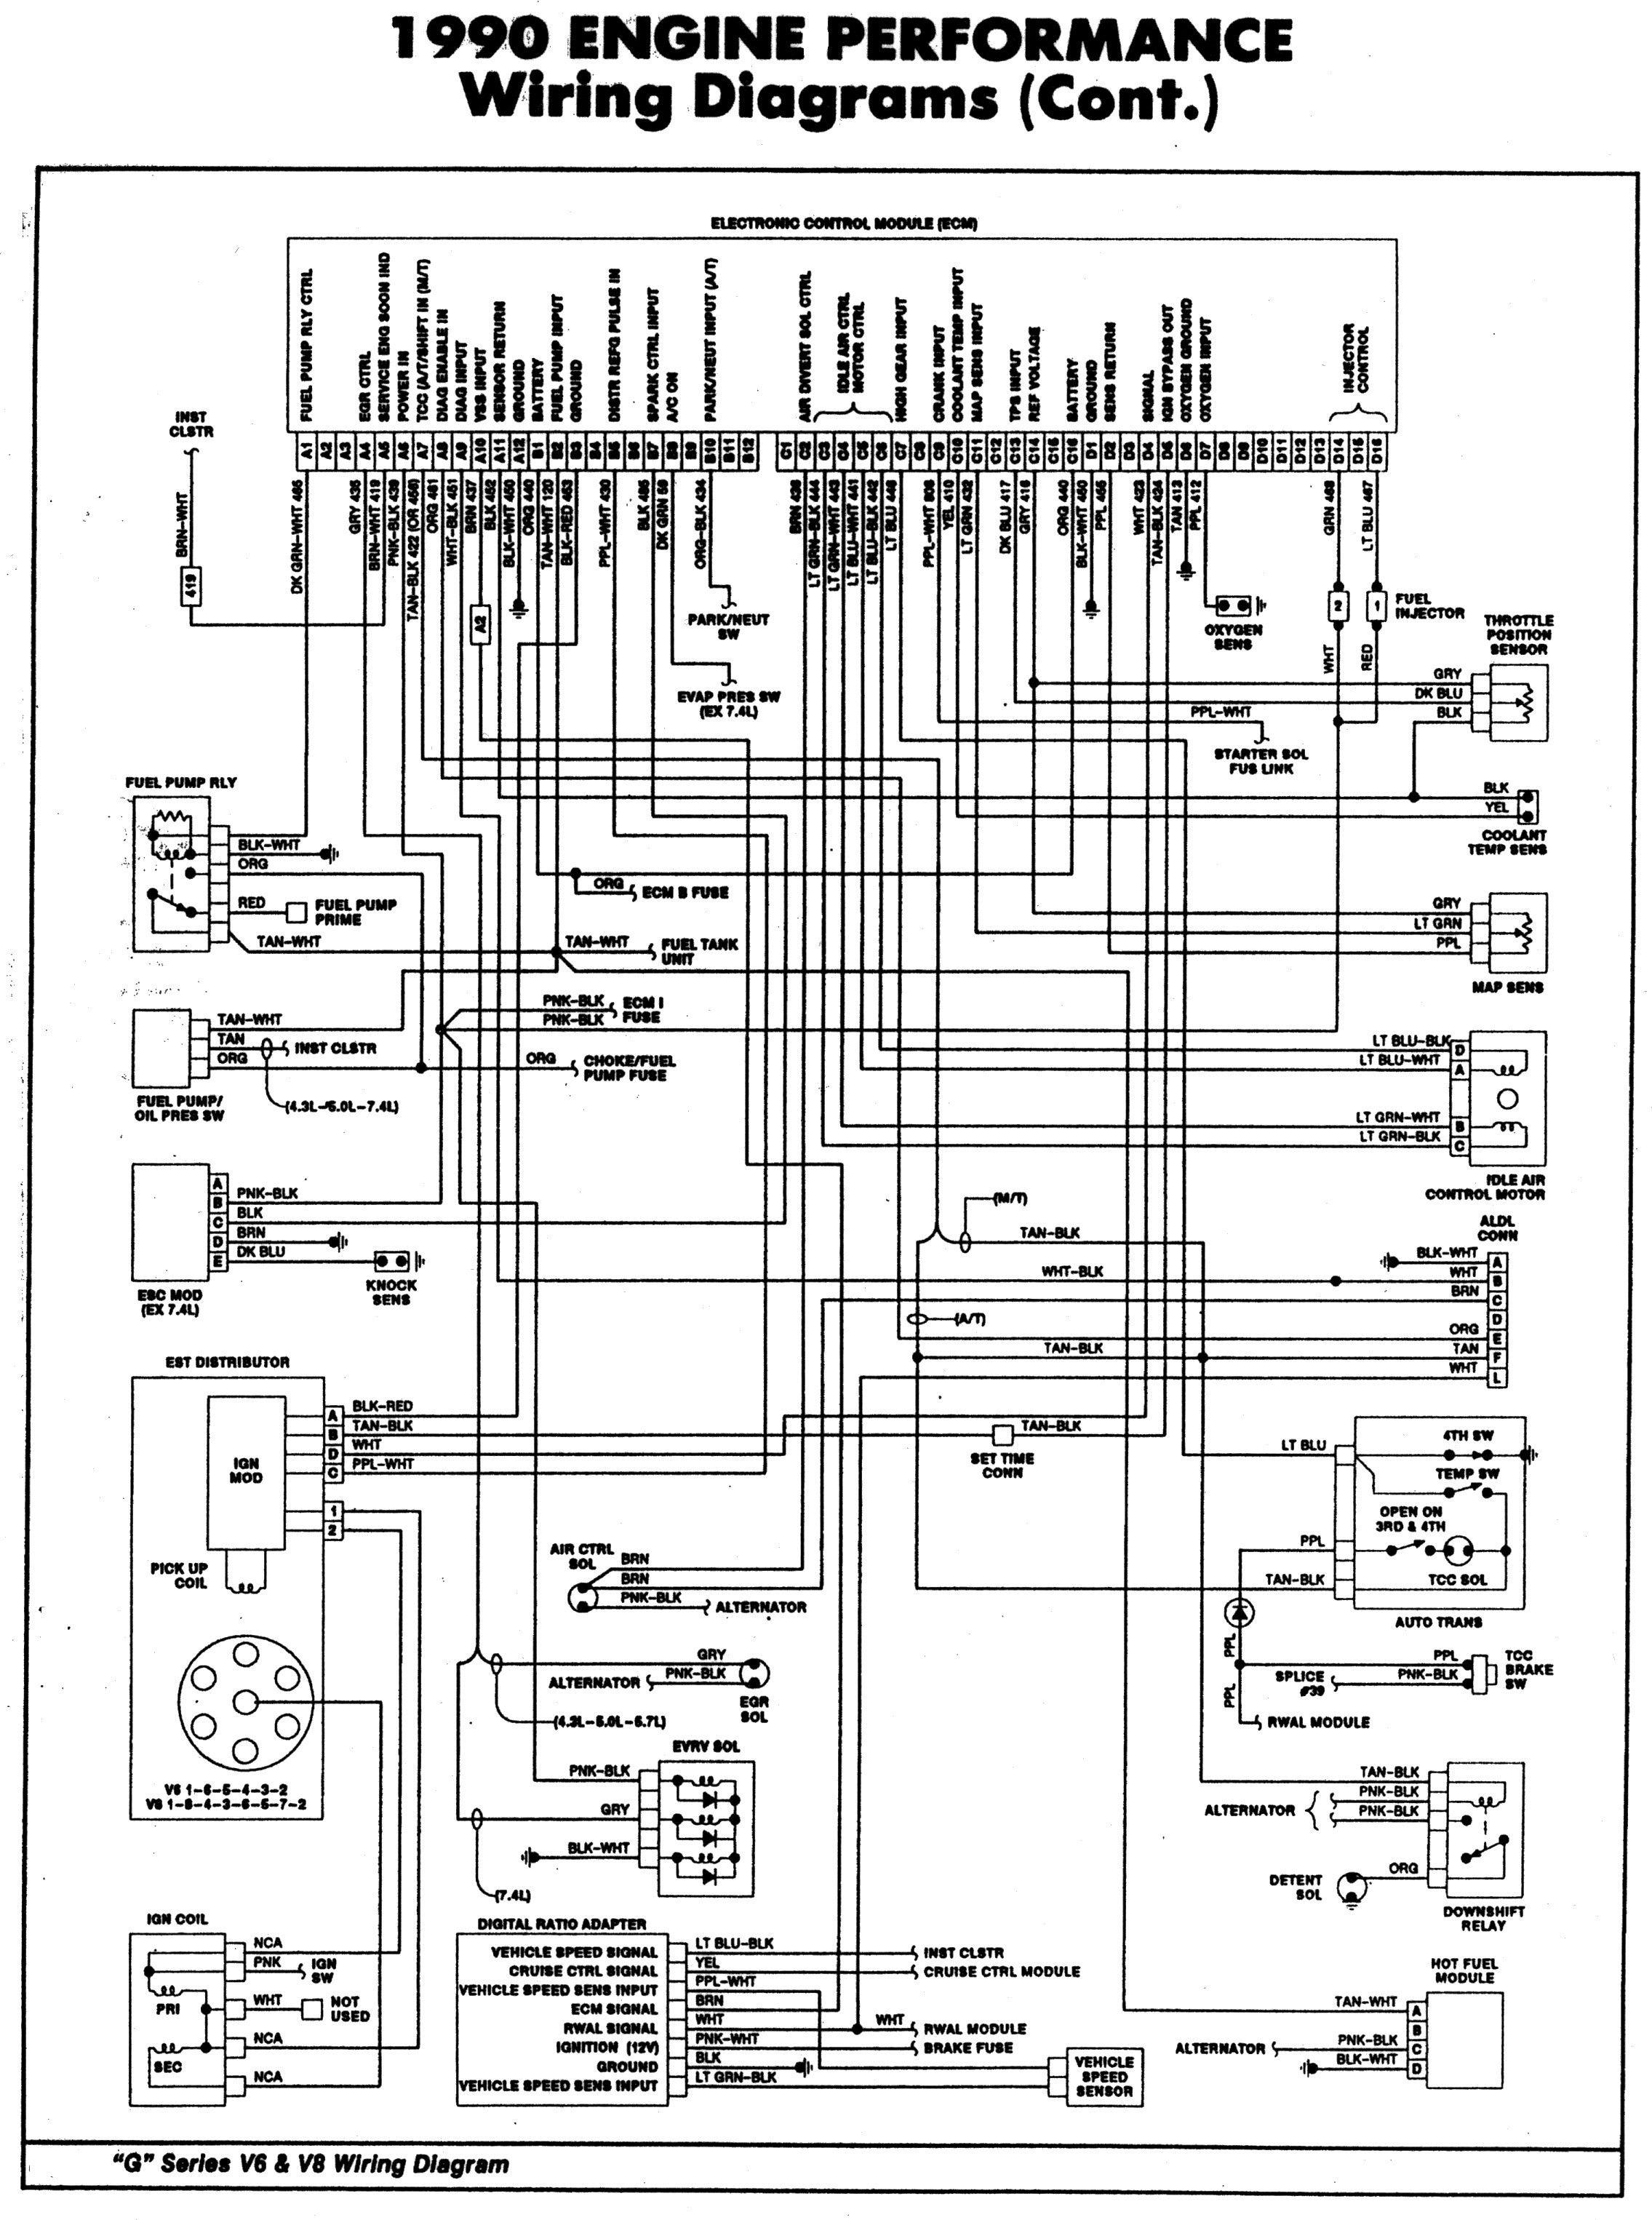 2000 S10 Radio Wiring Diagram Free Picture